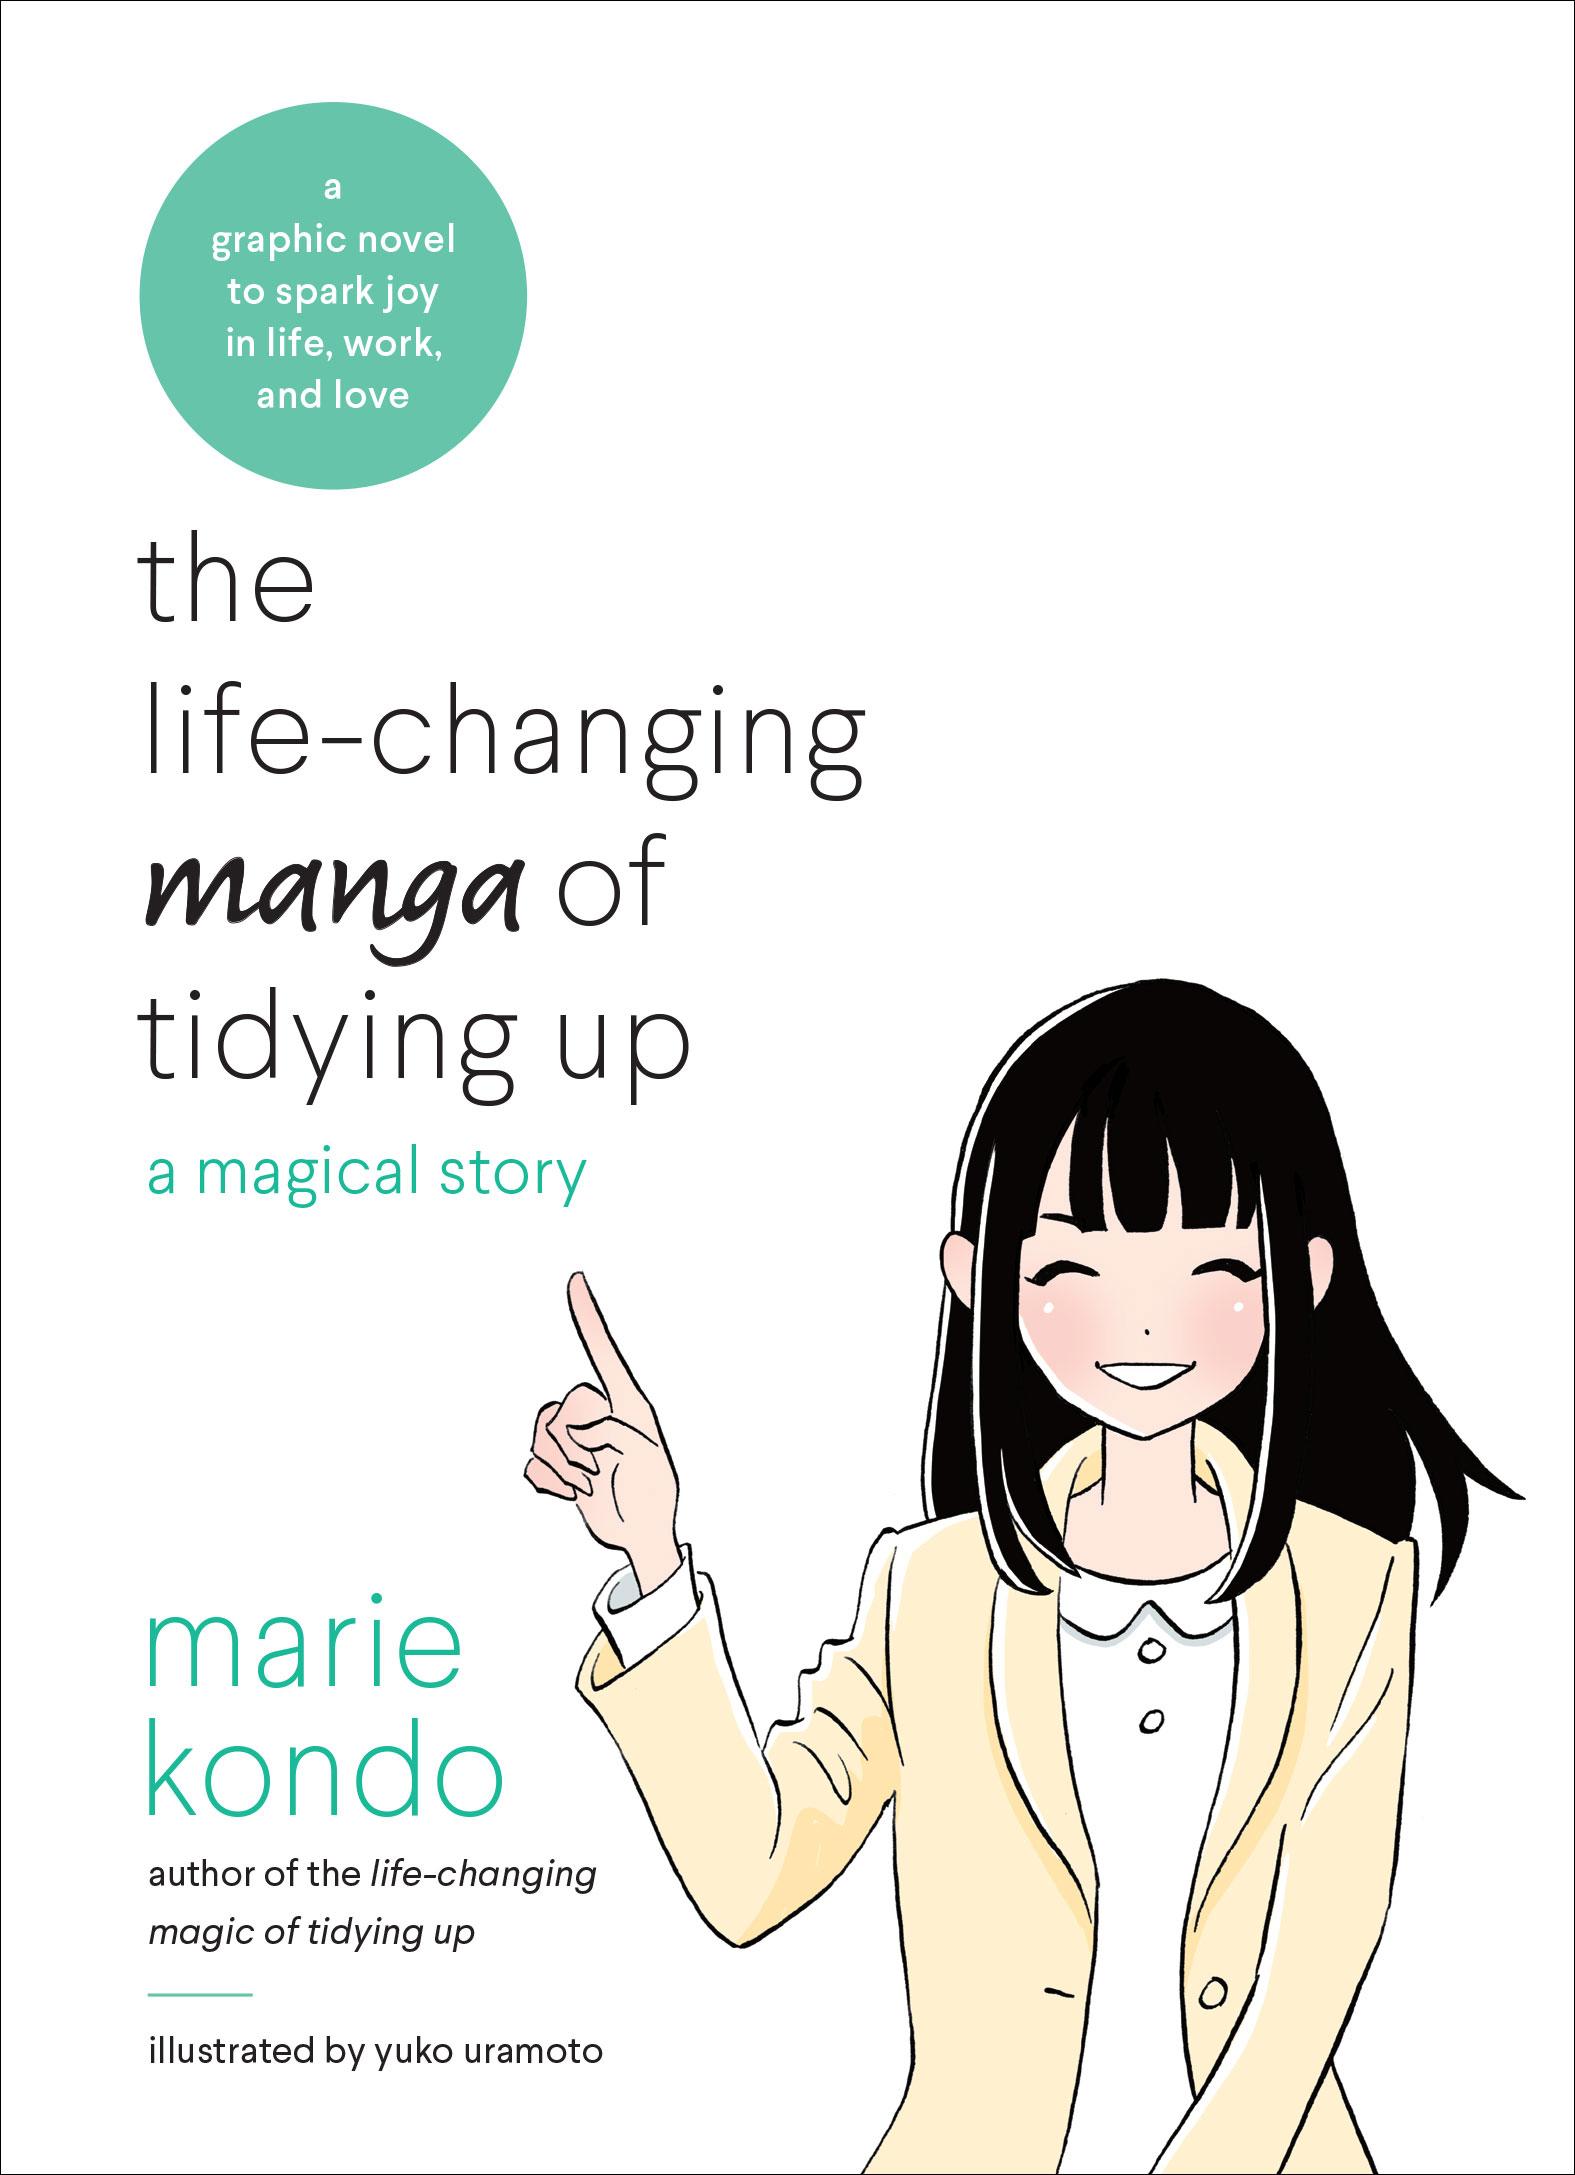 marie kondo graphic novel cover